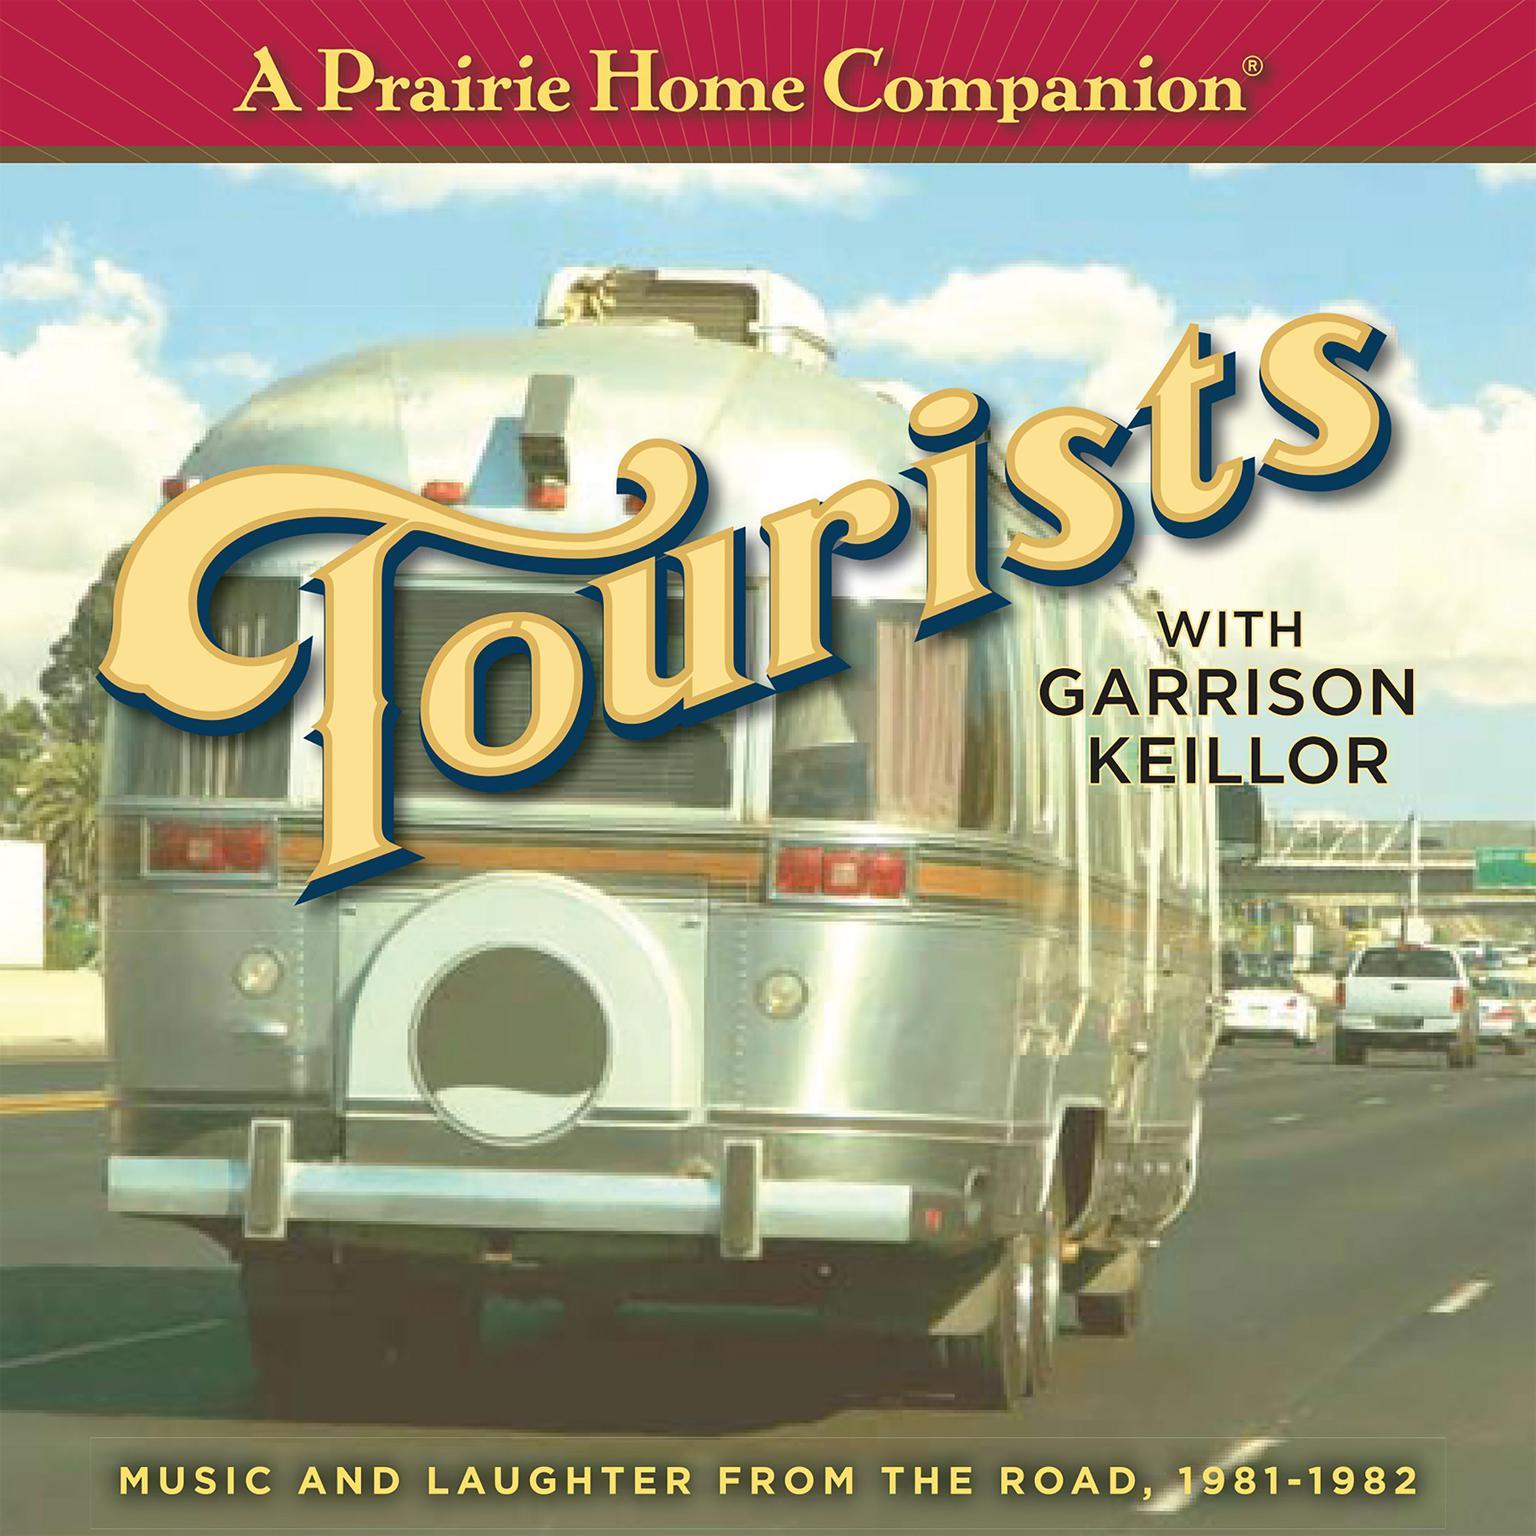 A Prairie Home Companion: Tourists Audiobook, by Garrison Keillor